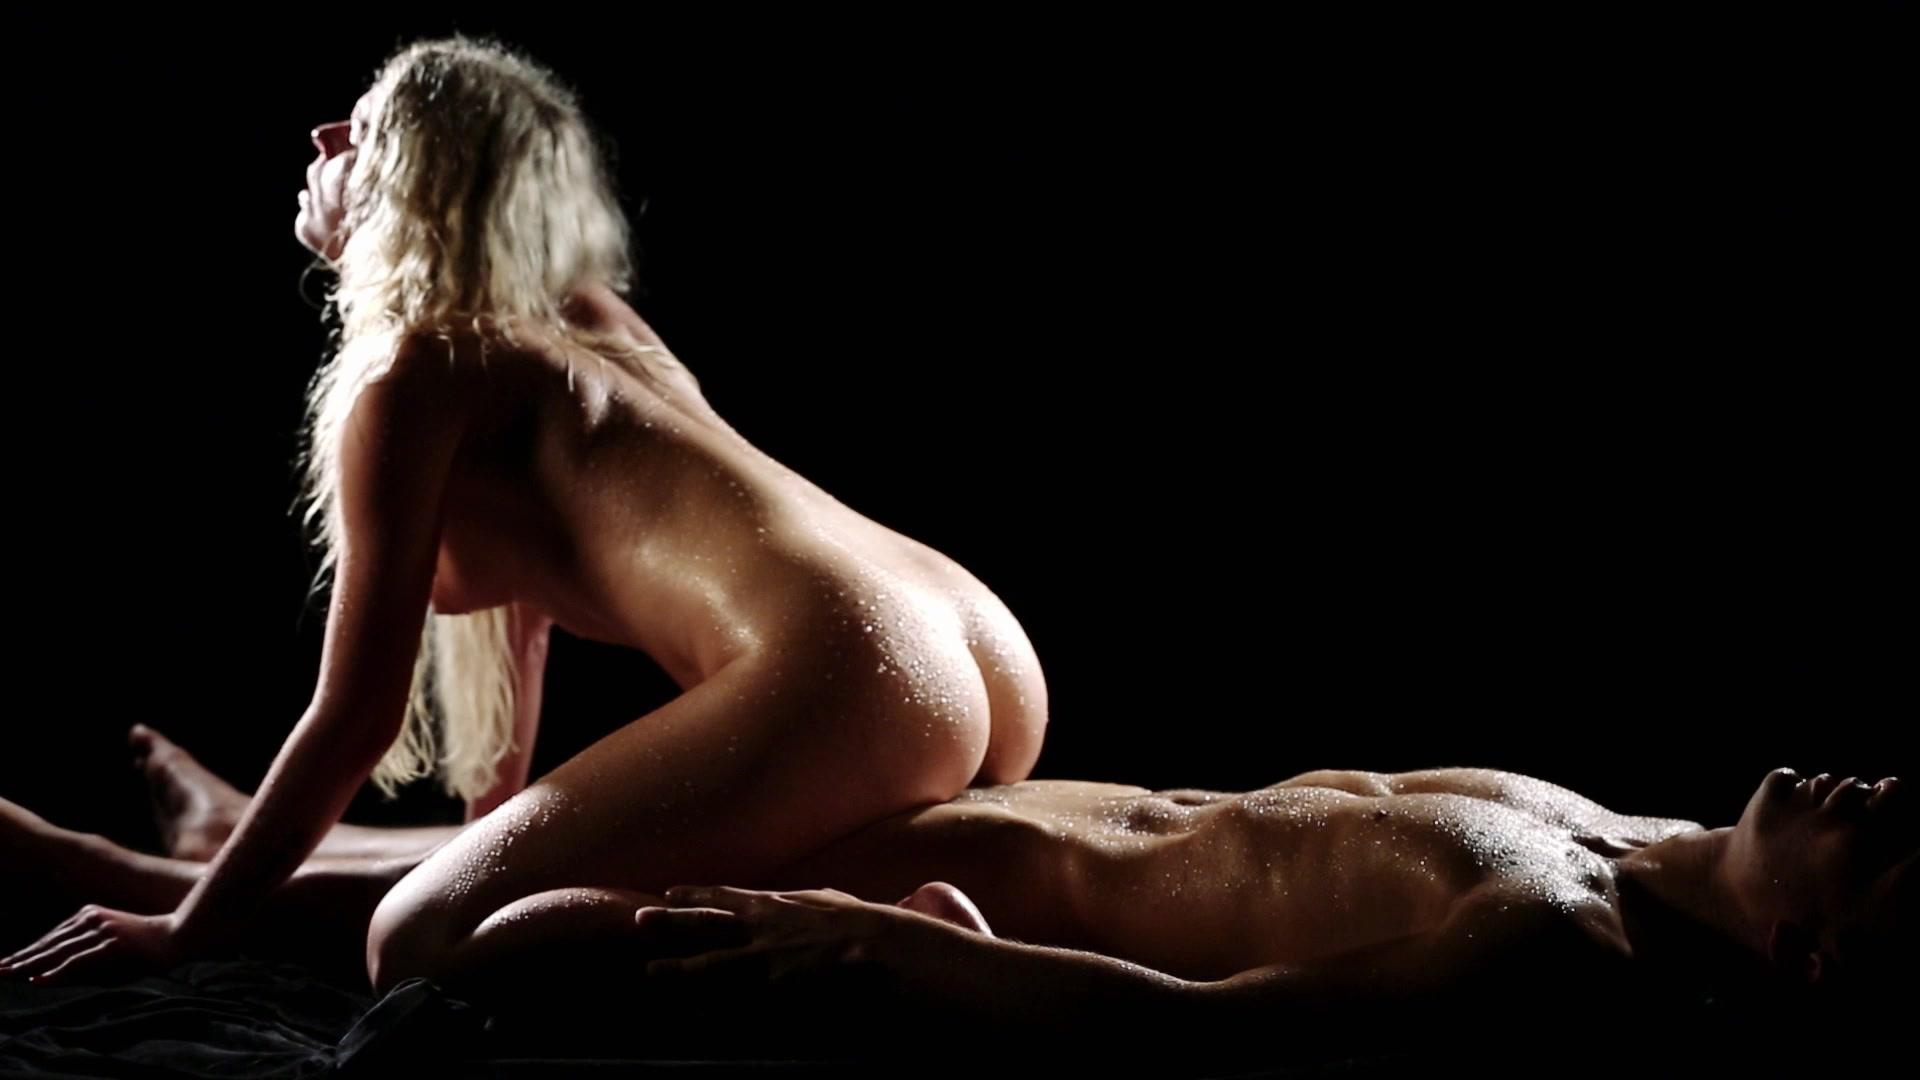 красивая эротика экстаз крики онлайн слезла сергиного